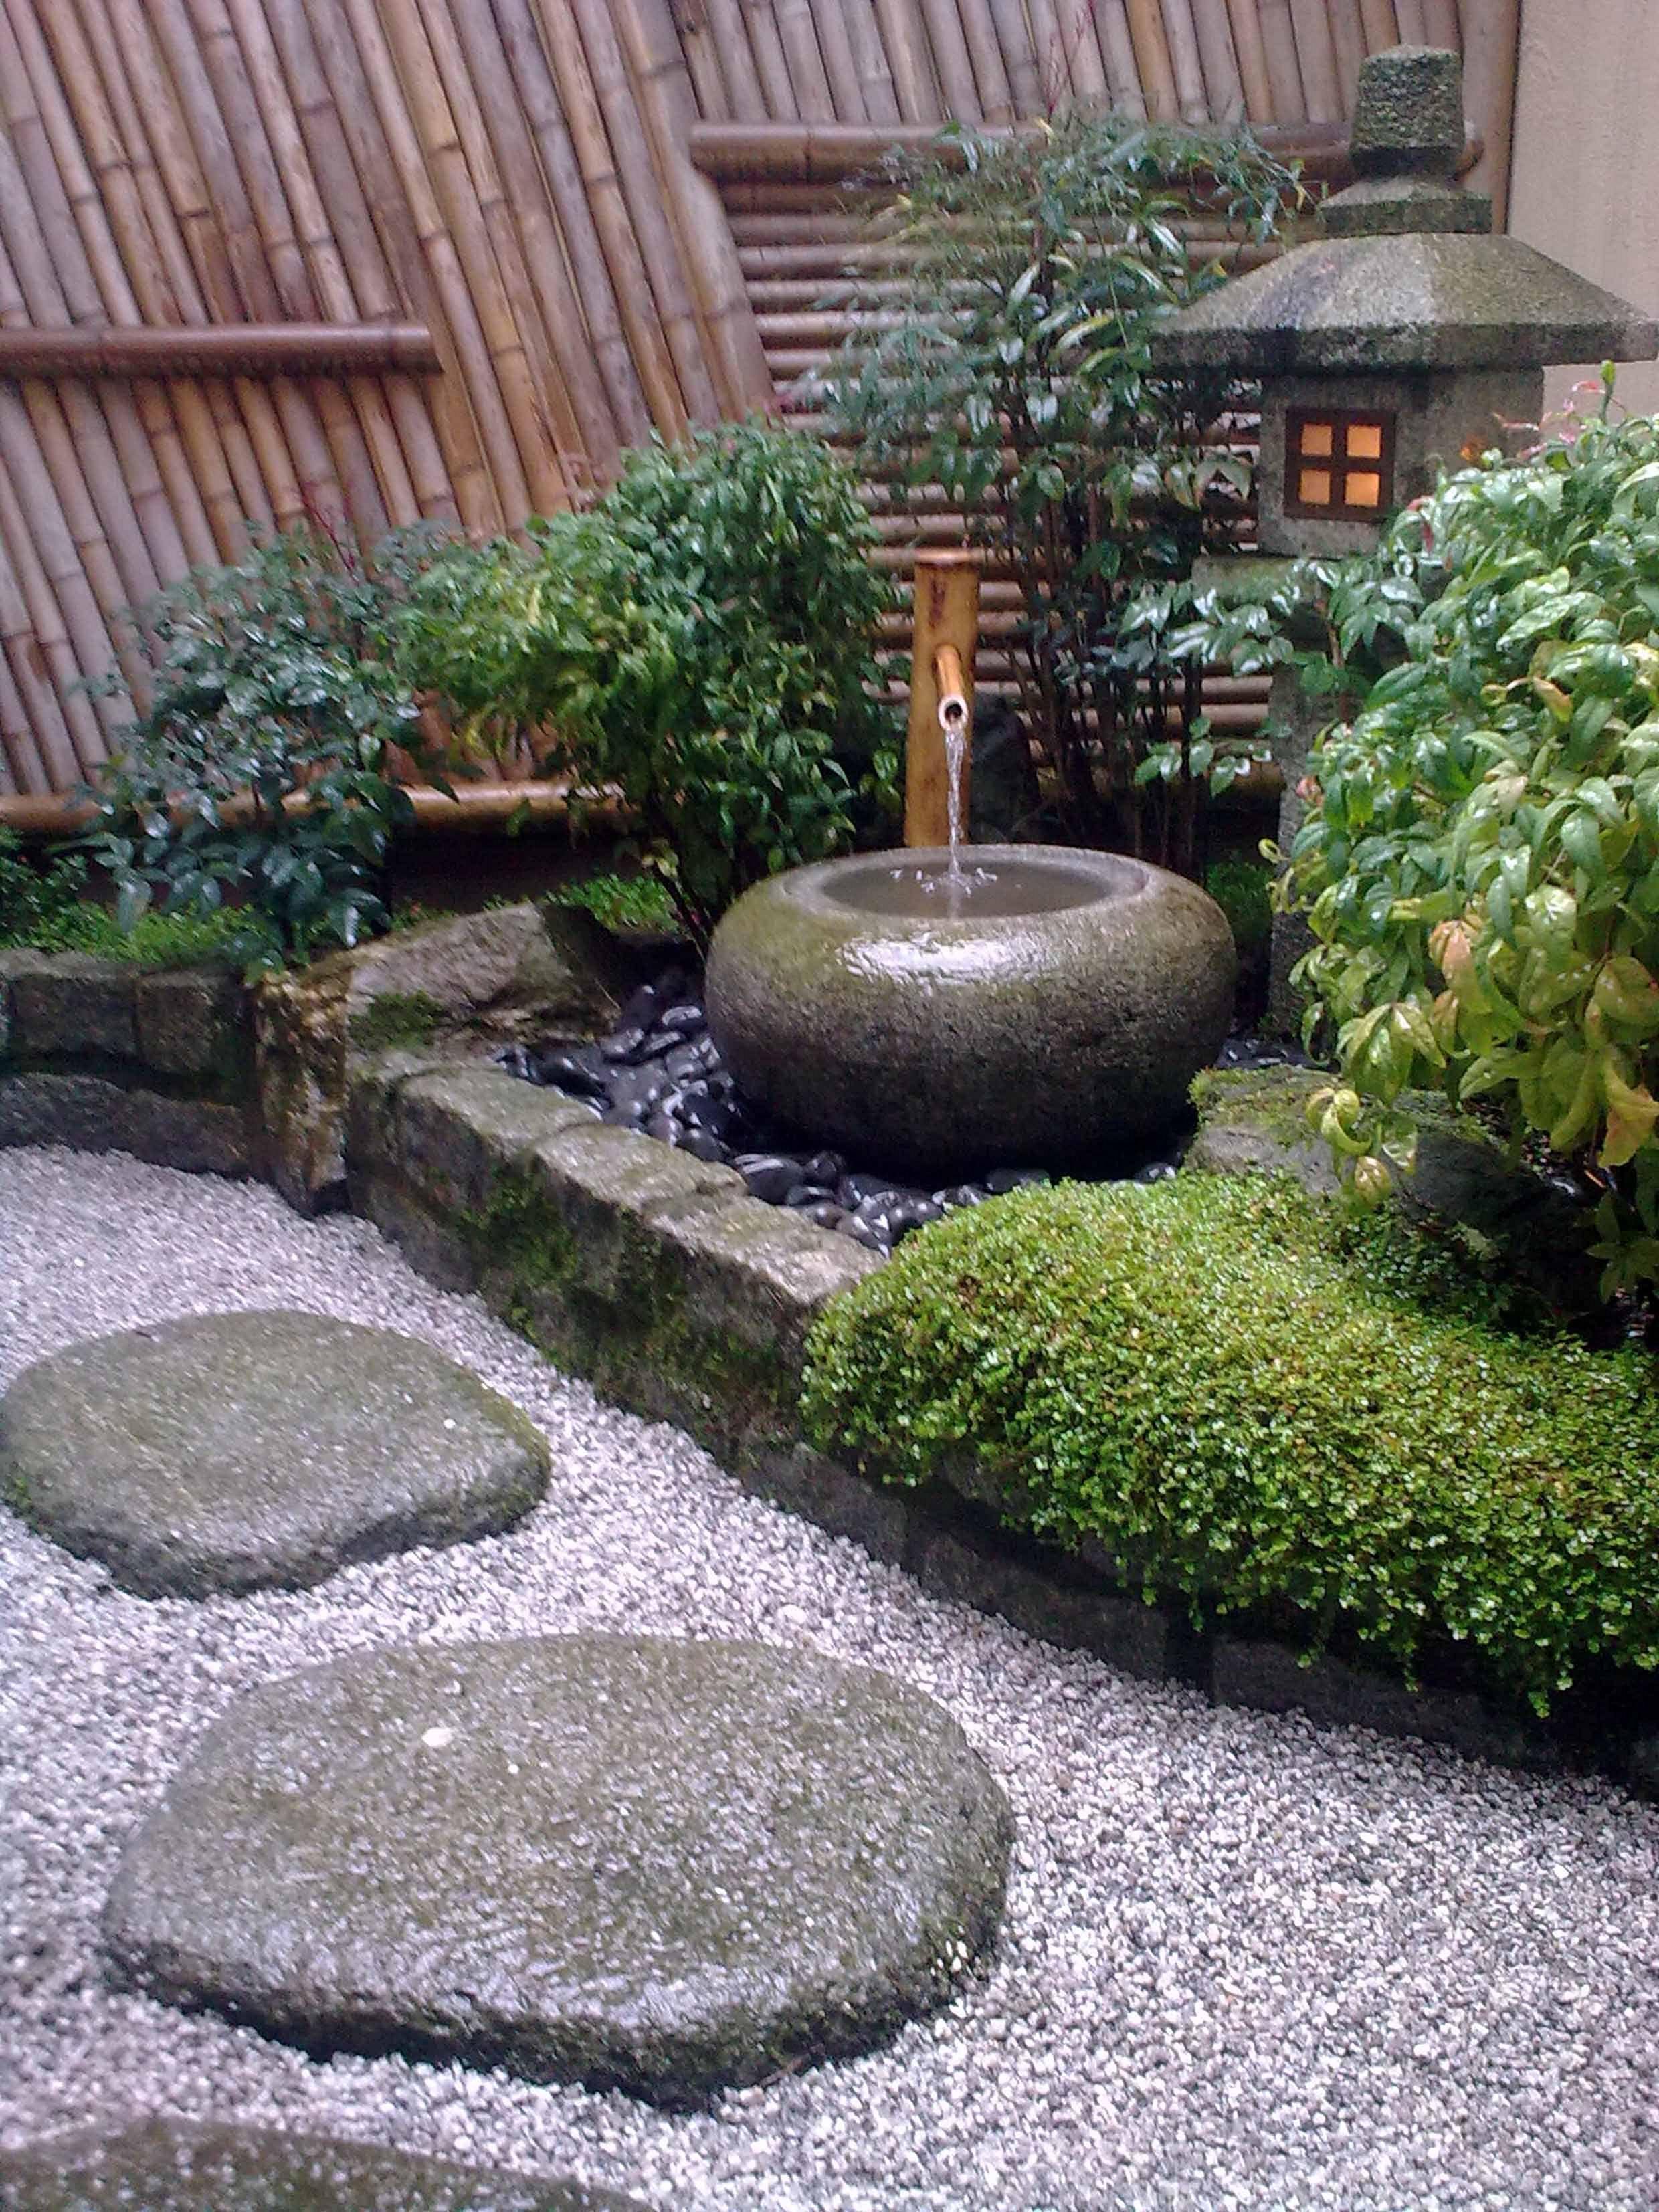 Small Backyard Zen Garden Ideas Frontyard Outdoorhouseplan Com In 2020 Japanischer Garten Anlegen Kleiner Japanischer Garten Garten Anlegen